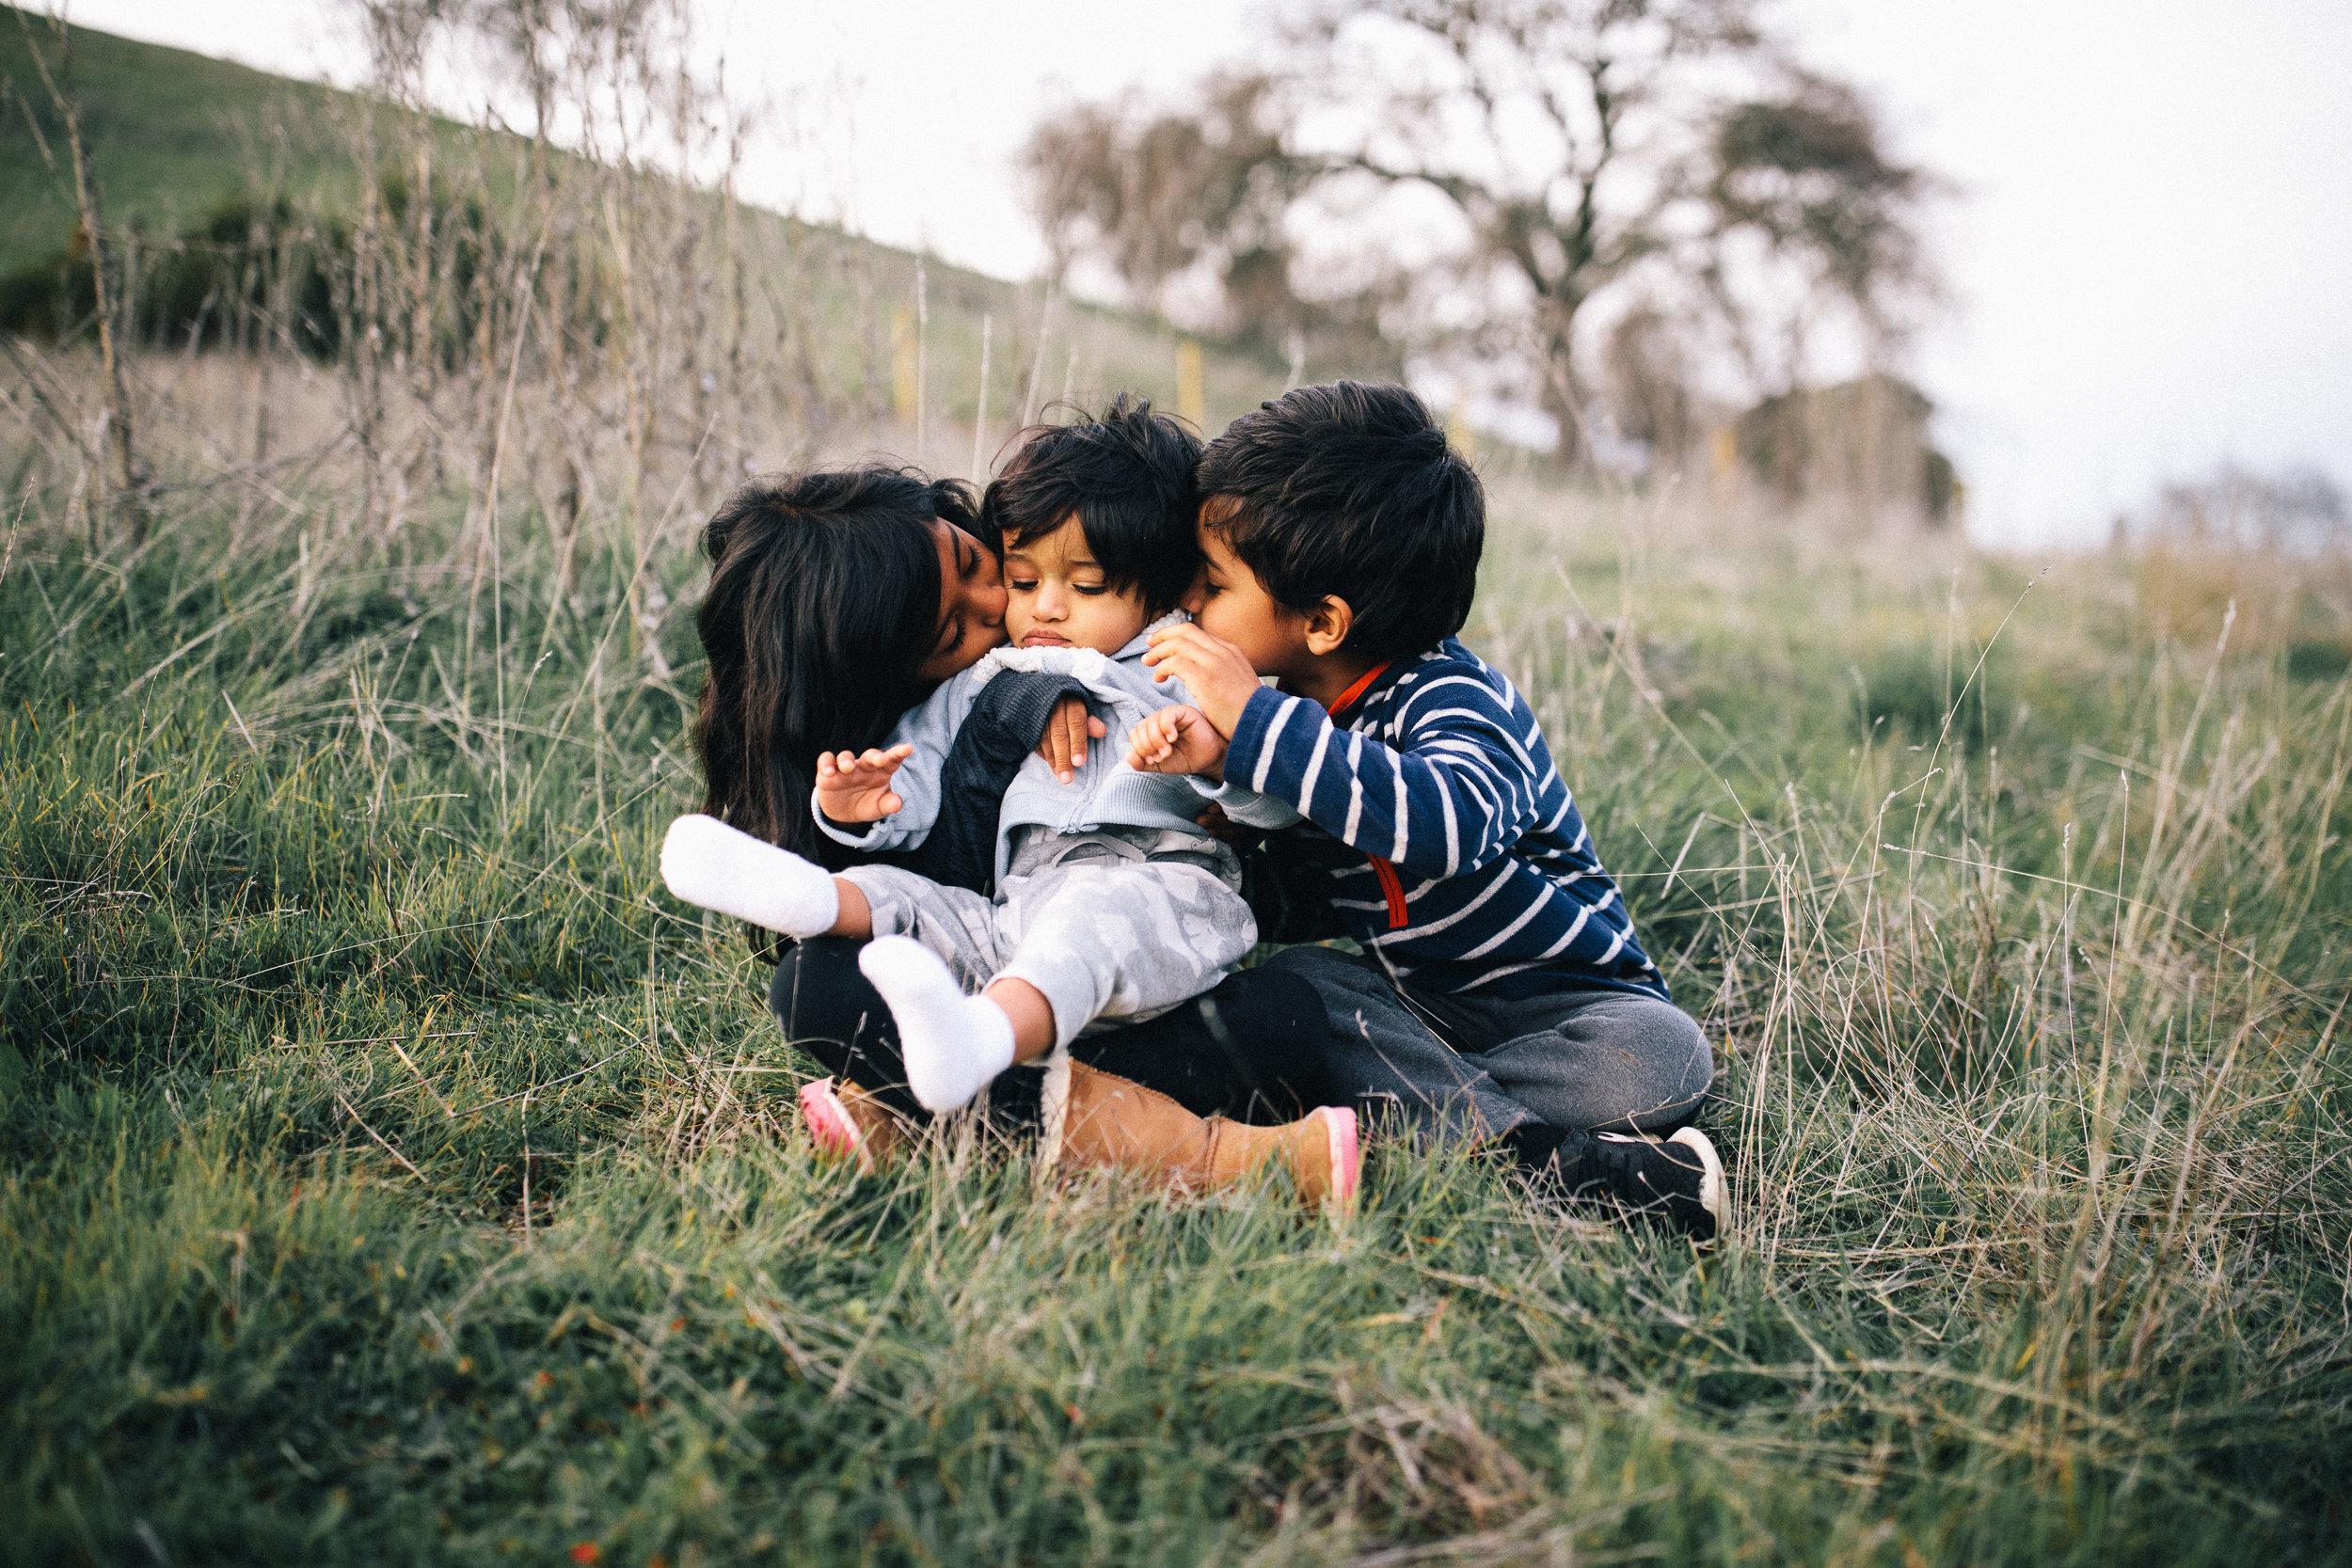 2018_01_01 Ahmad Family Session Blog Photos Edited Full Resolution 0028.jpg